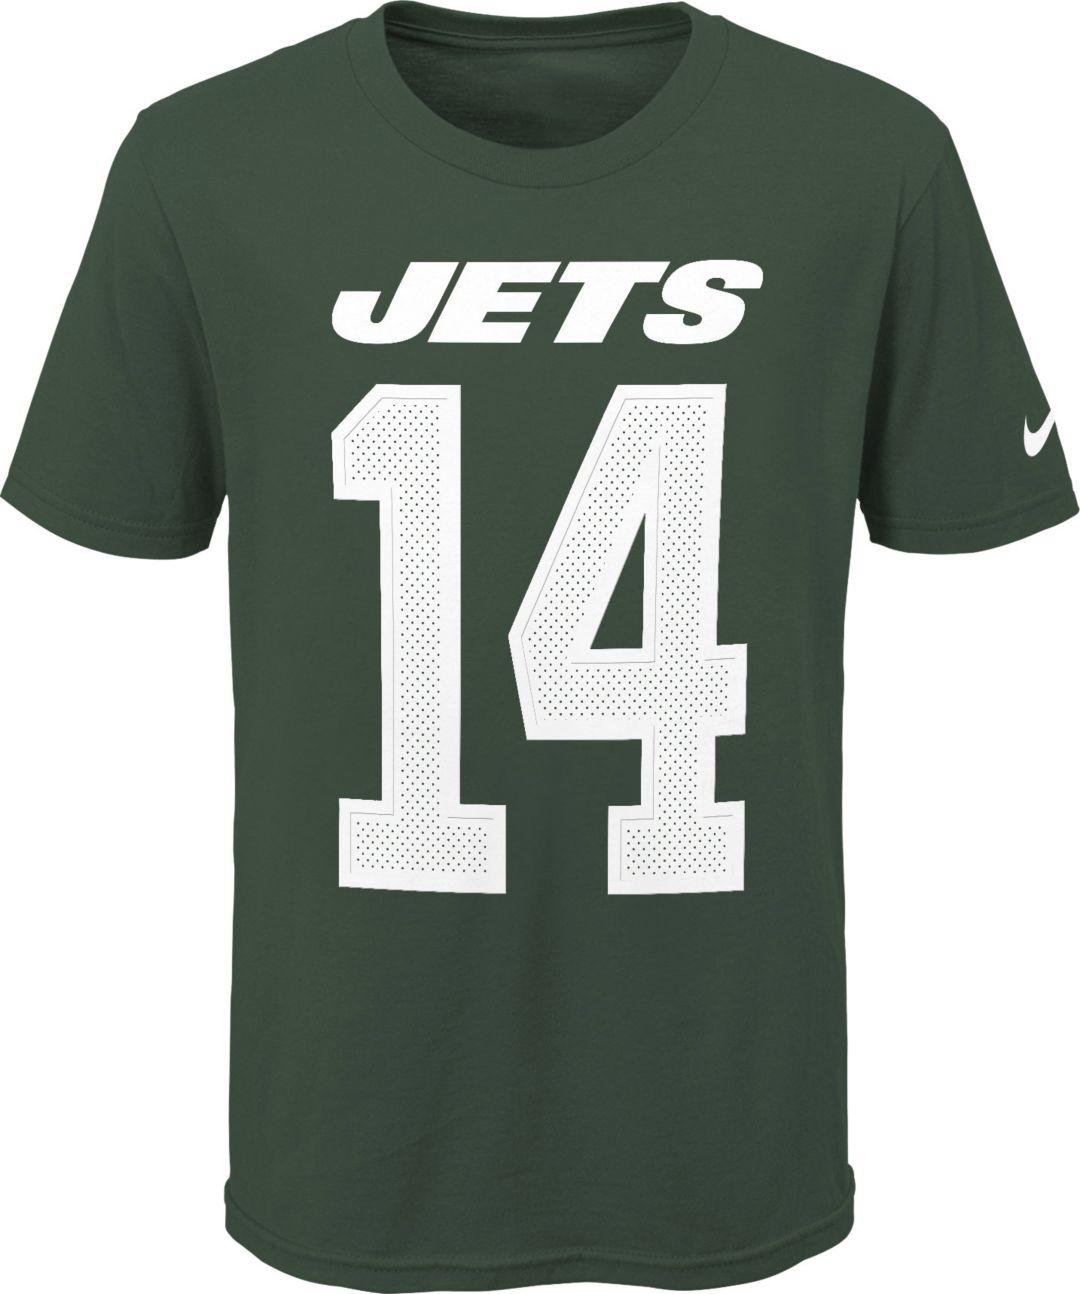 on sale 3daf1 c9cb7 Nike Youth New York Jets Sam Darnold #14 Pride Green T-Shirt